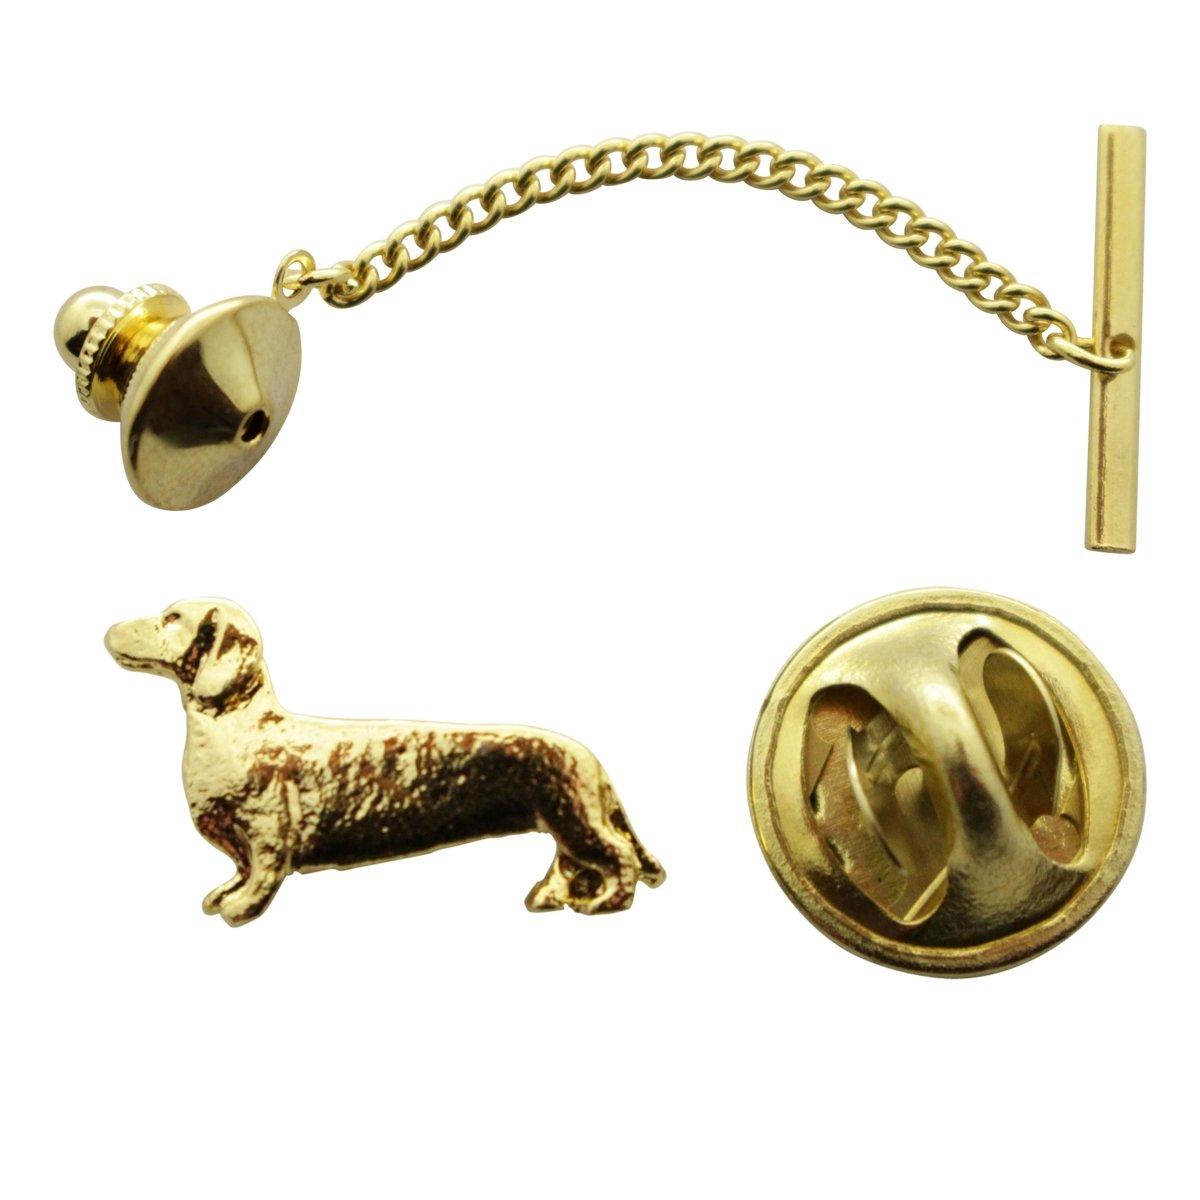 Dachshund Tie Tack ~ 24K Gold ~ Tie Tack or Pin ~ Sarah's Treats & Treasures by Sarah's Treats & Treasures (Image #1)